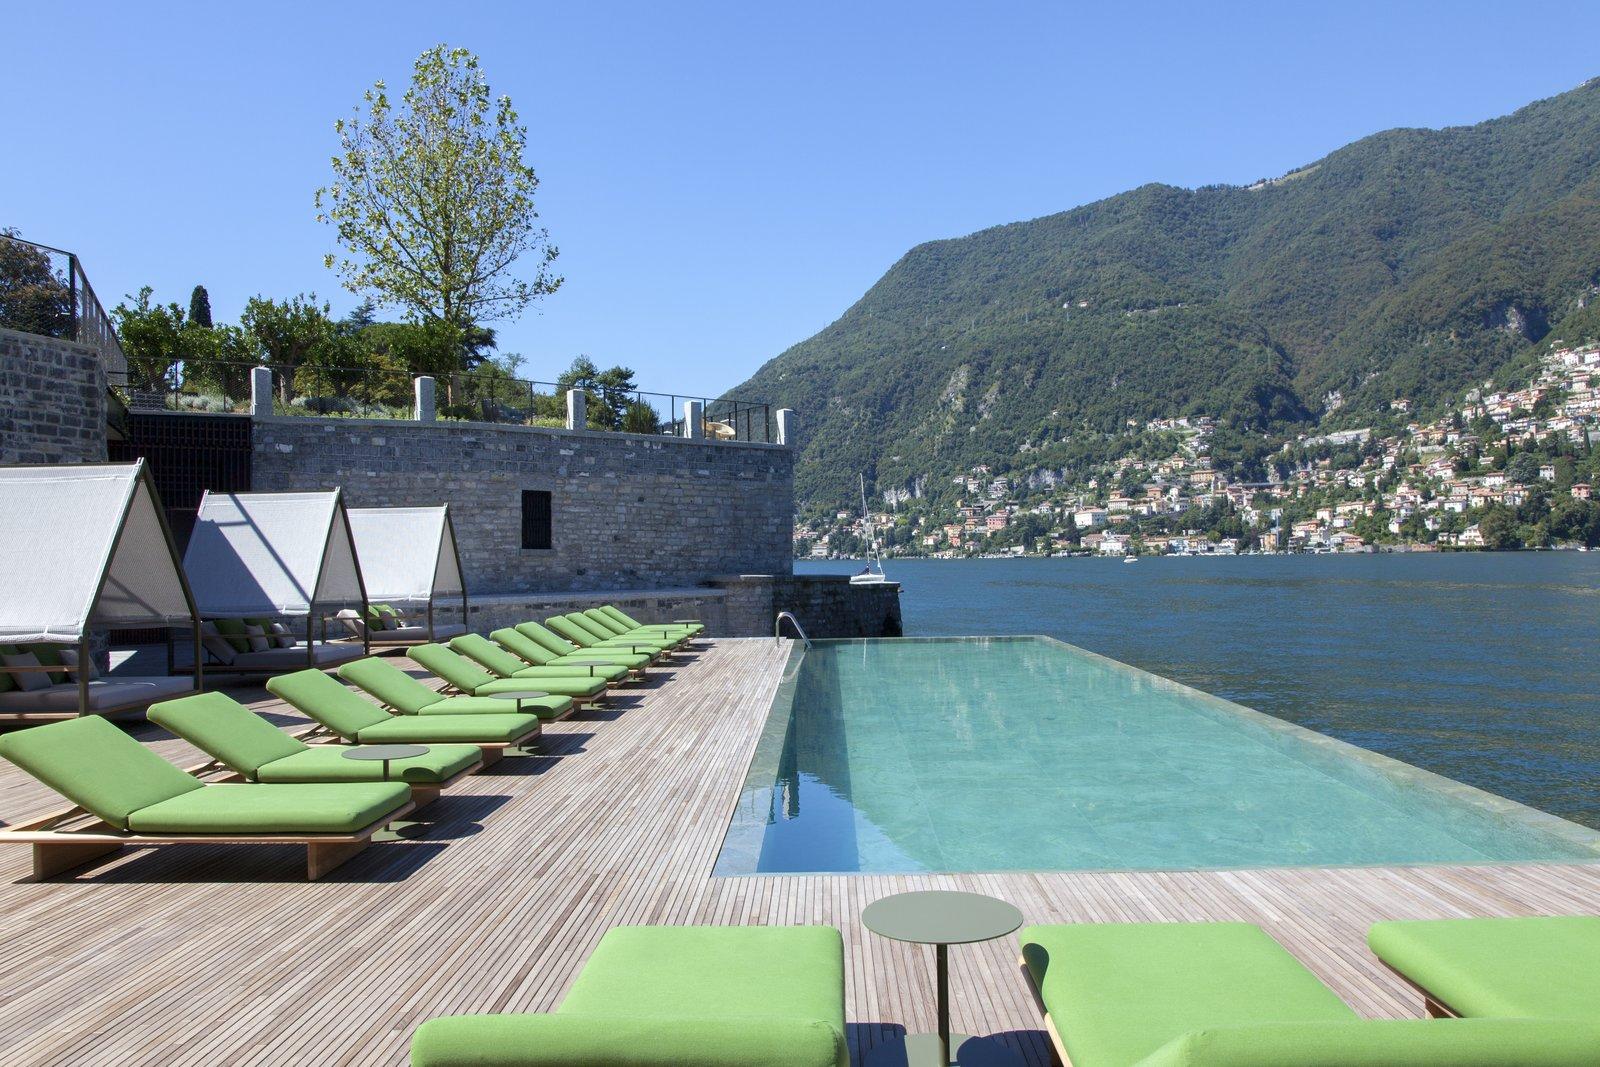 Photo 6 of 12 in A Modern Lake Como Retreat Designed by Patricia Urquiola